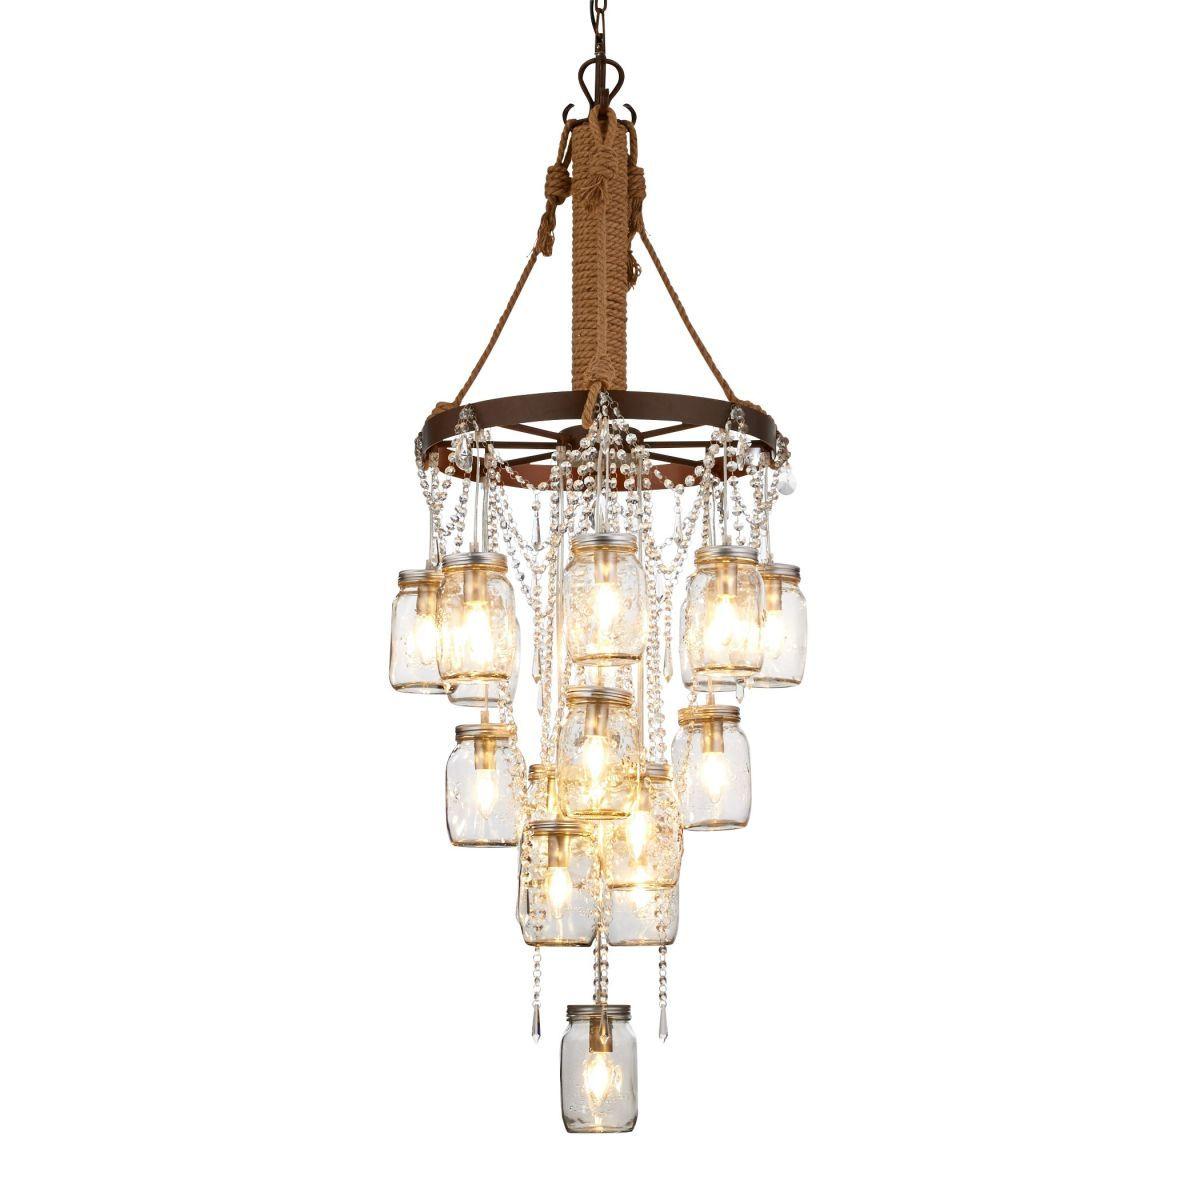 kronleuchter 17 weckgl ser als lampenschirme kristallbehang industrial look metall glas. Black Bedroom Furniture Sets. Home Design Ideas